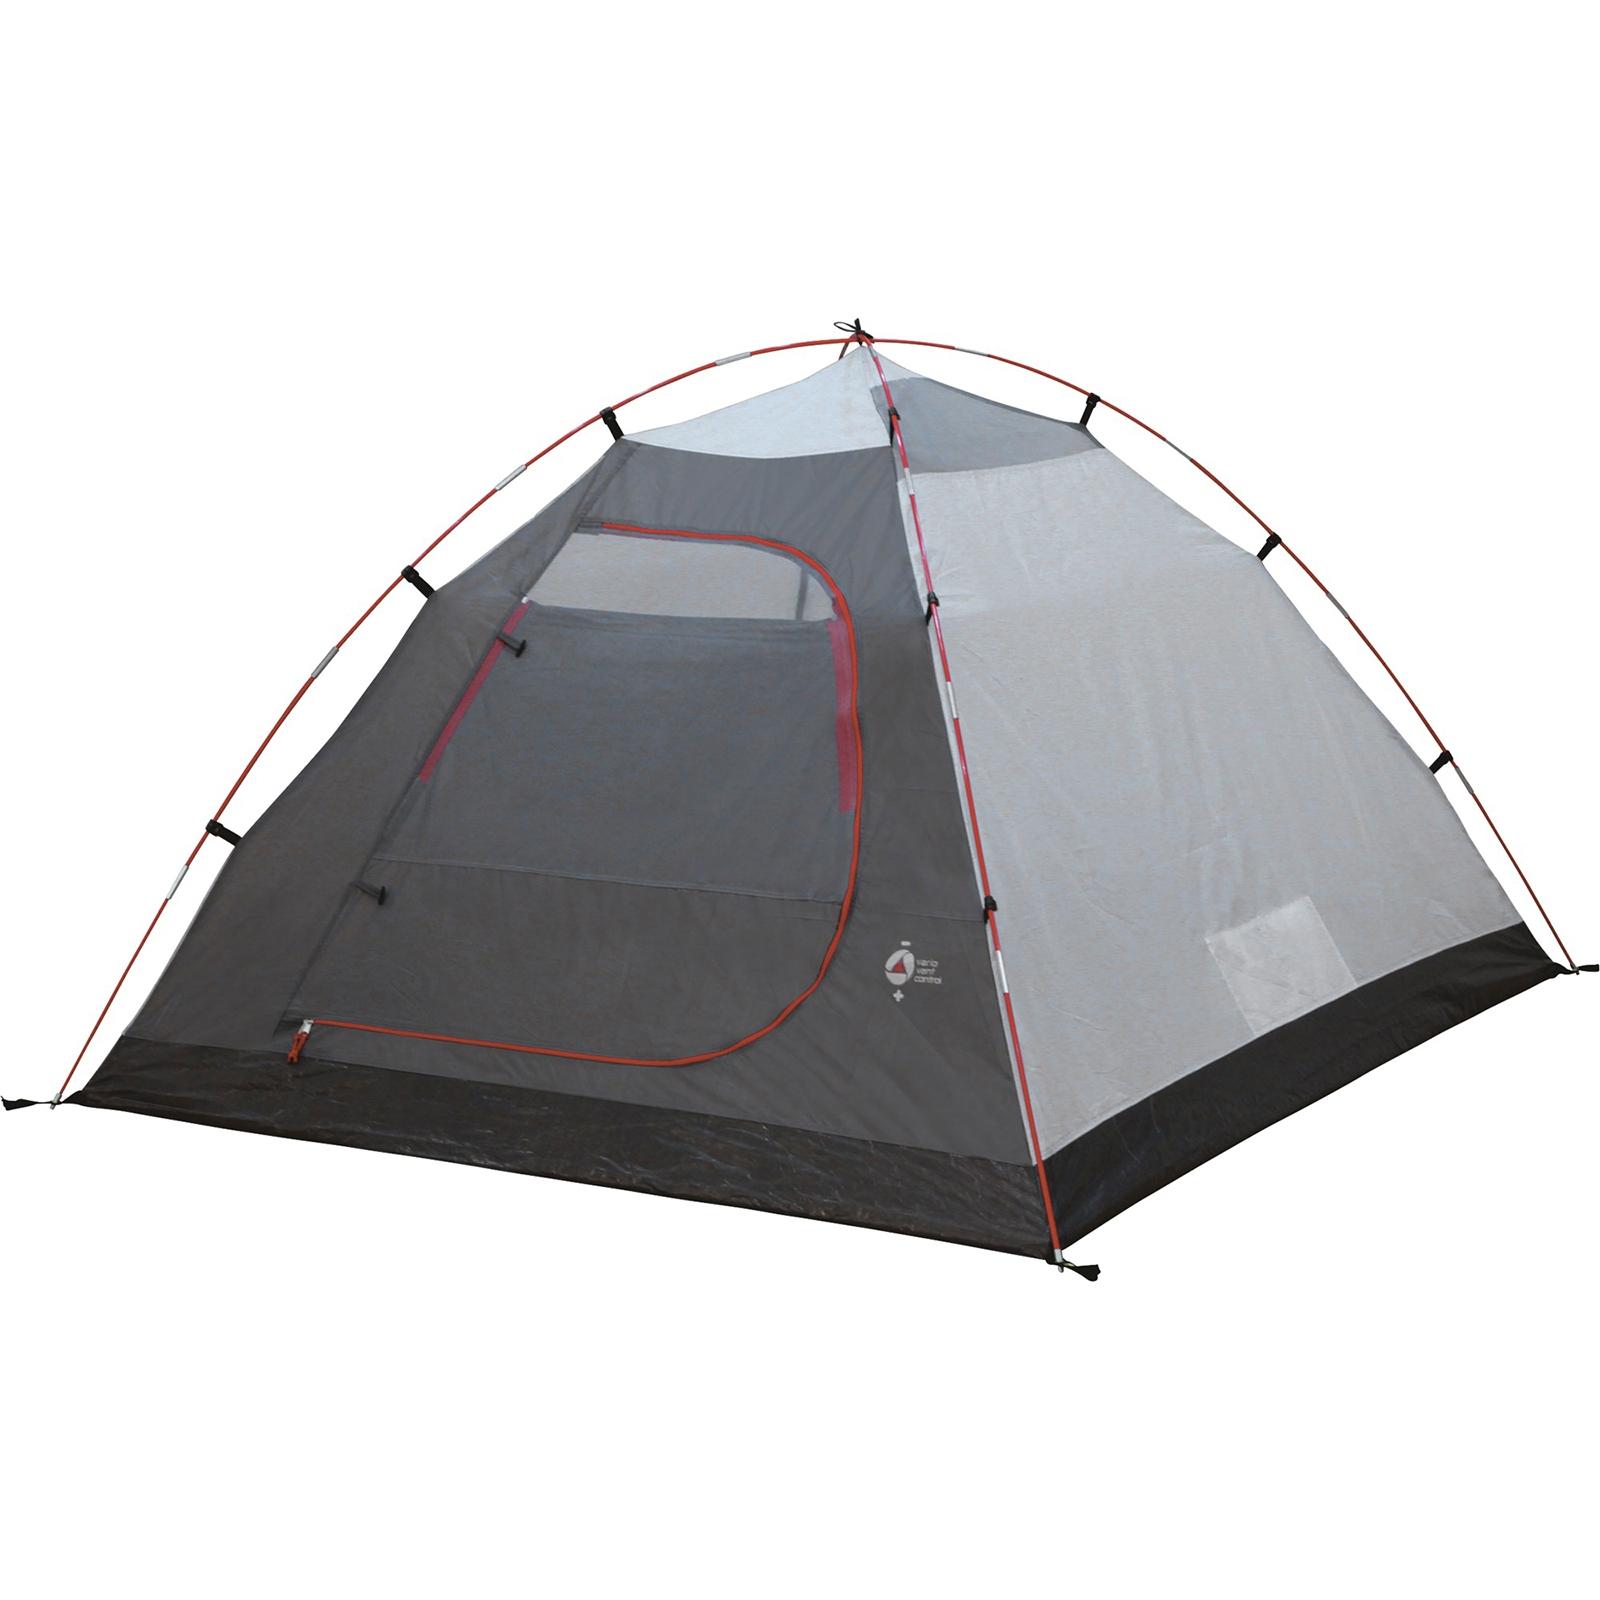 Палатка High Peak Nevada 4 Dark Grey/Red (926274) изображение 3